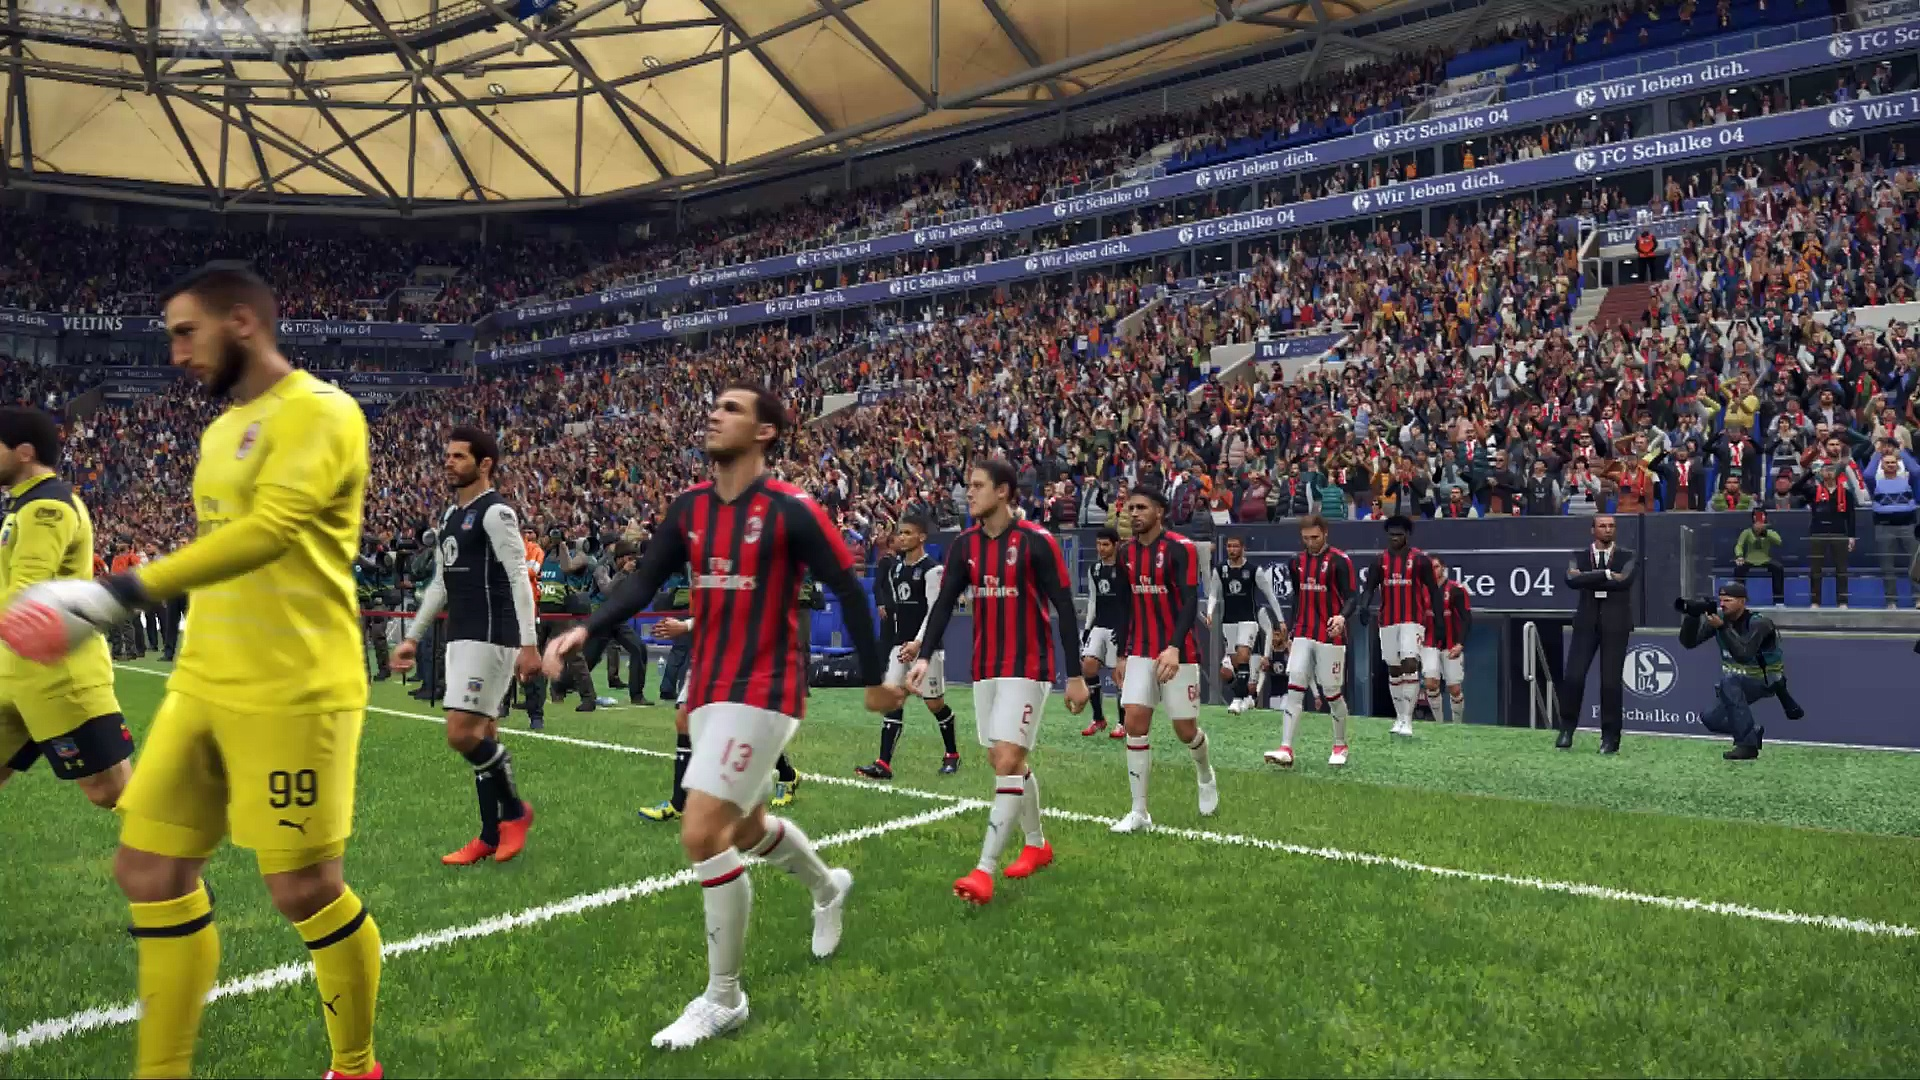 PES2019 PC Milan-Colo Colo demo